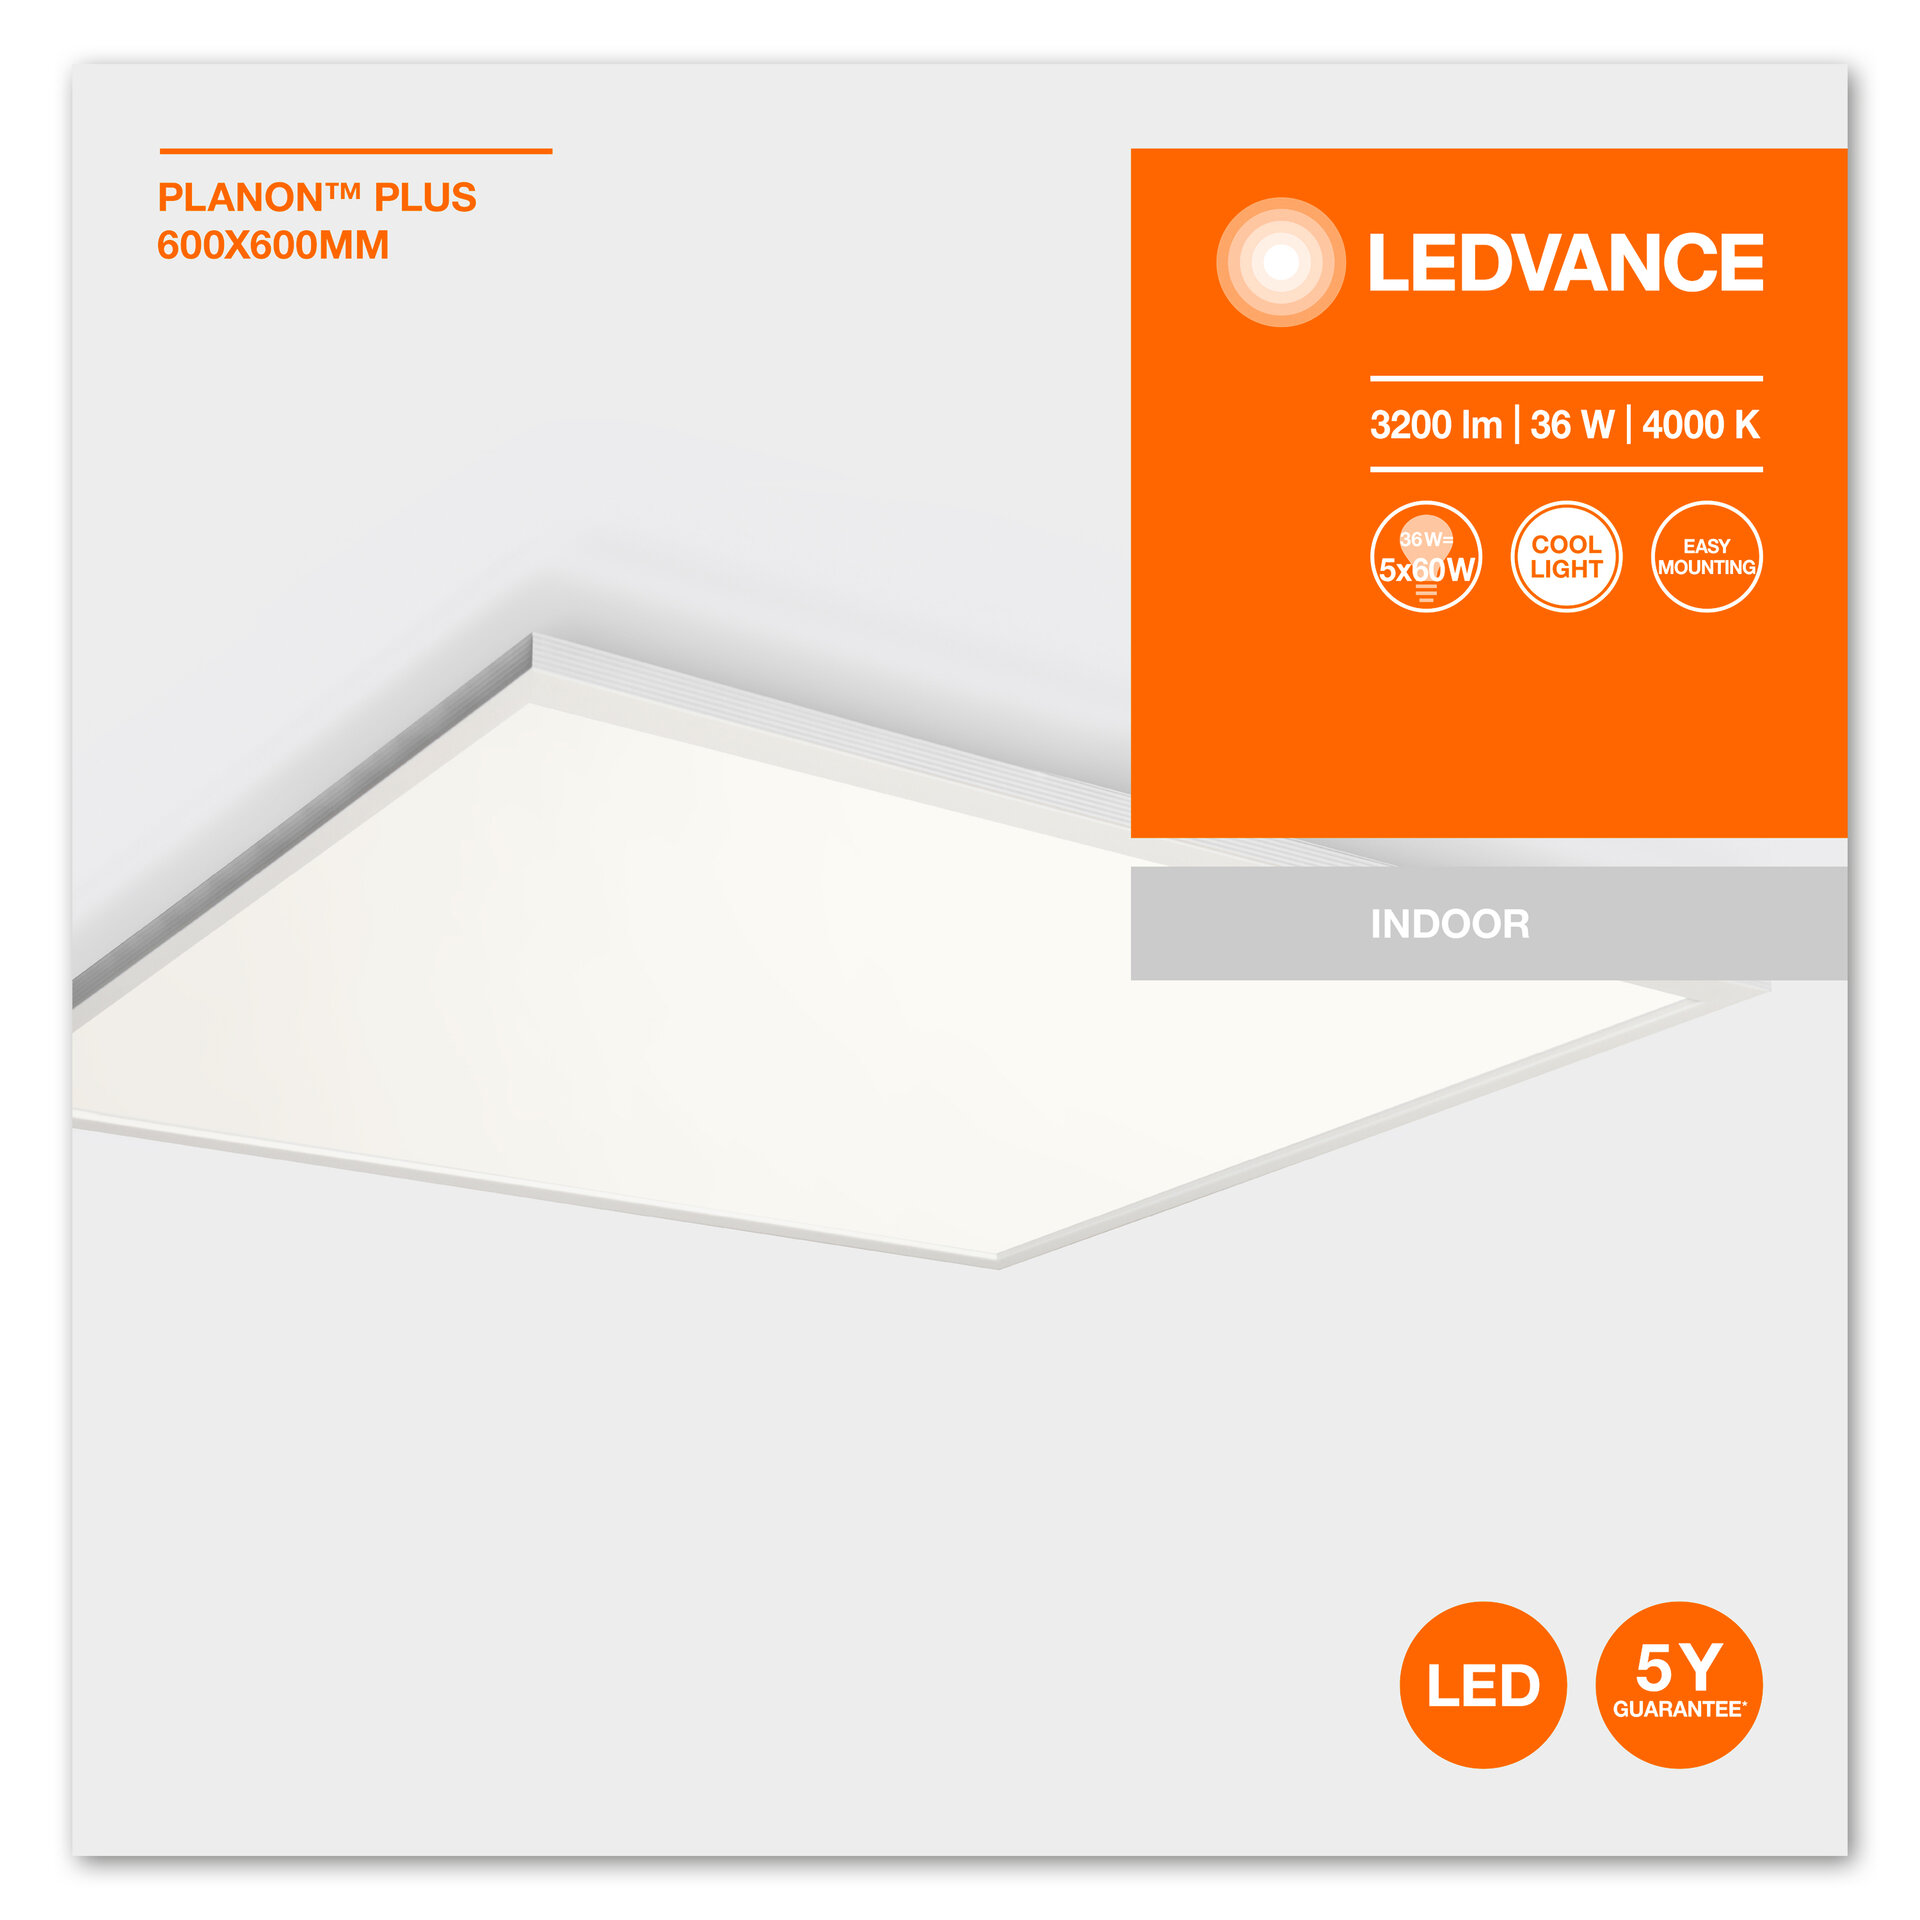 (106) LED ПАНЕЛ LEDVANCE PLANON PLUS 600x600 36W 4000K